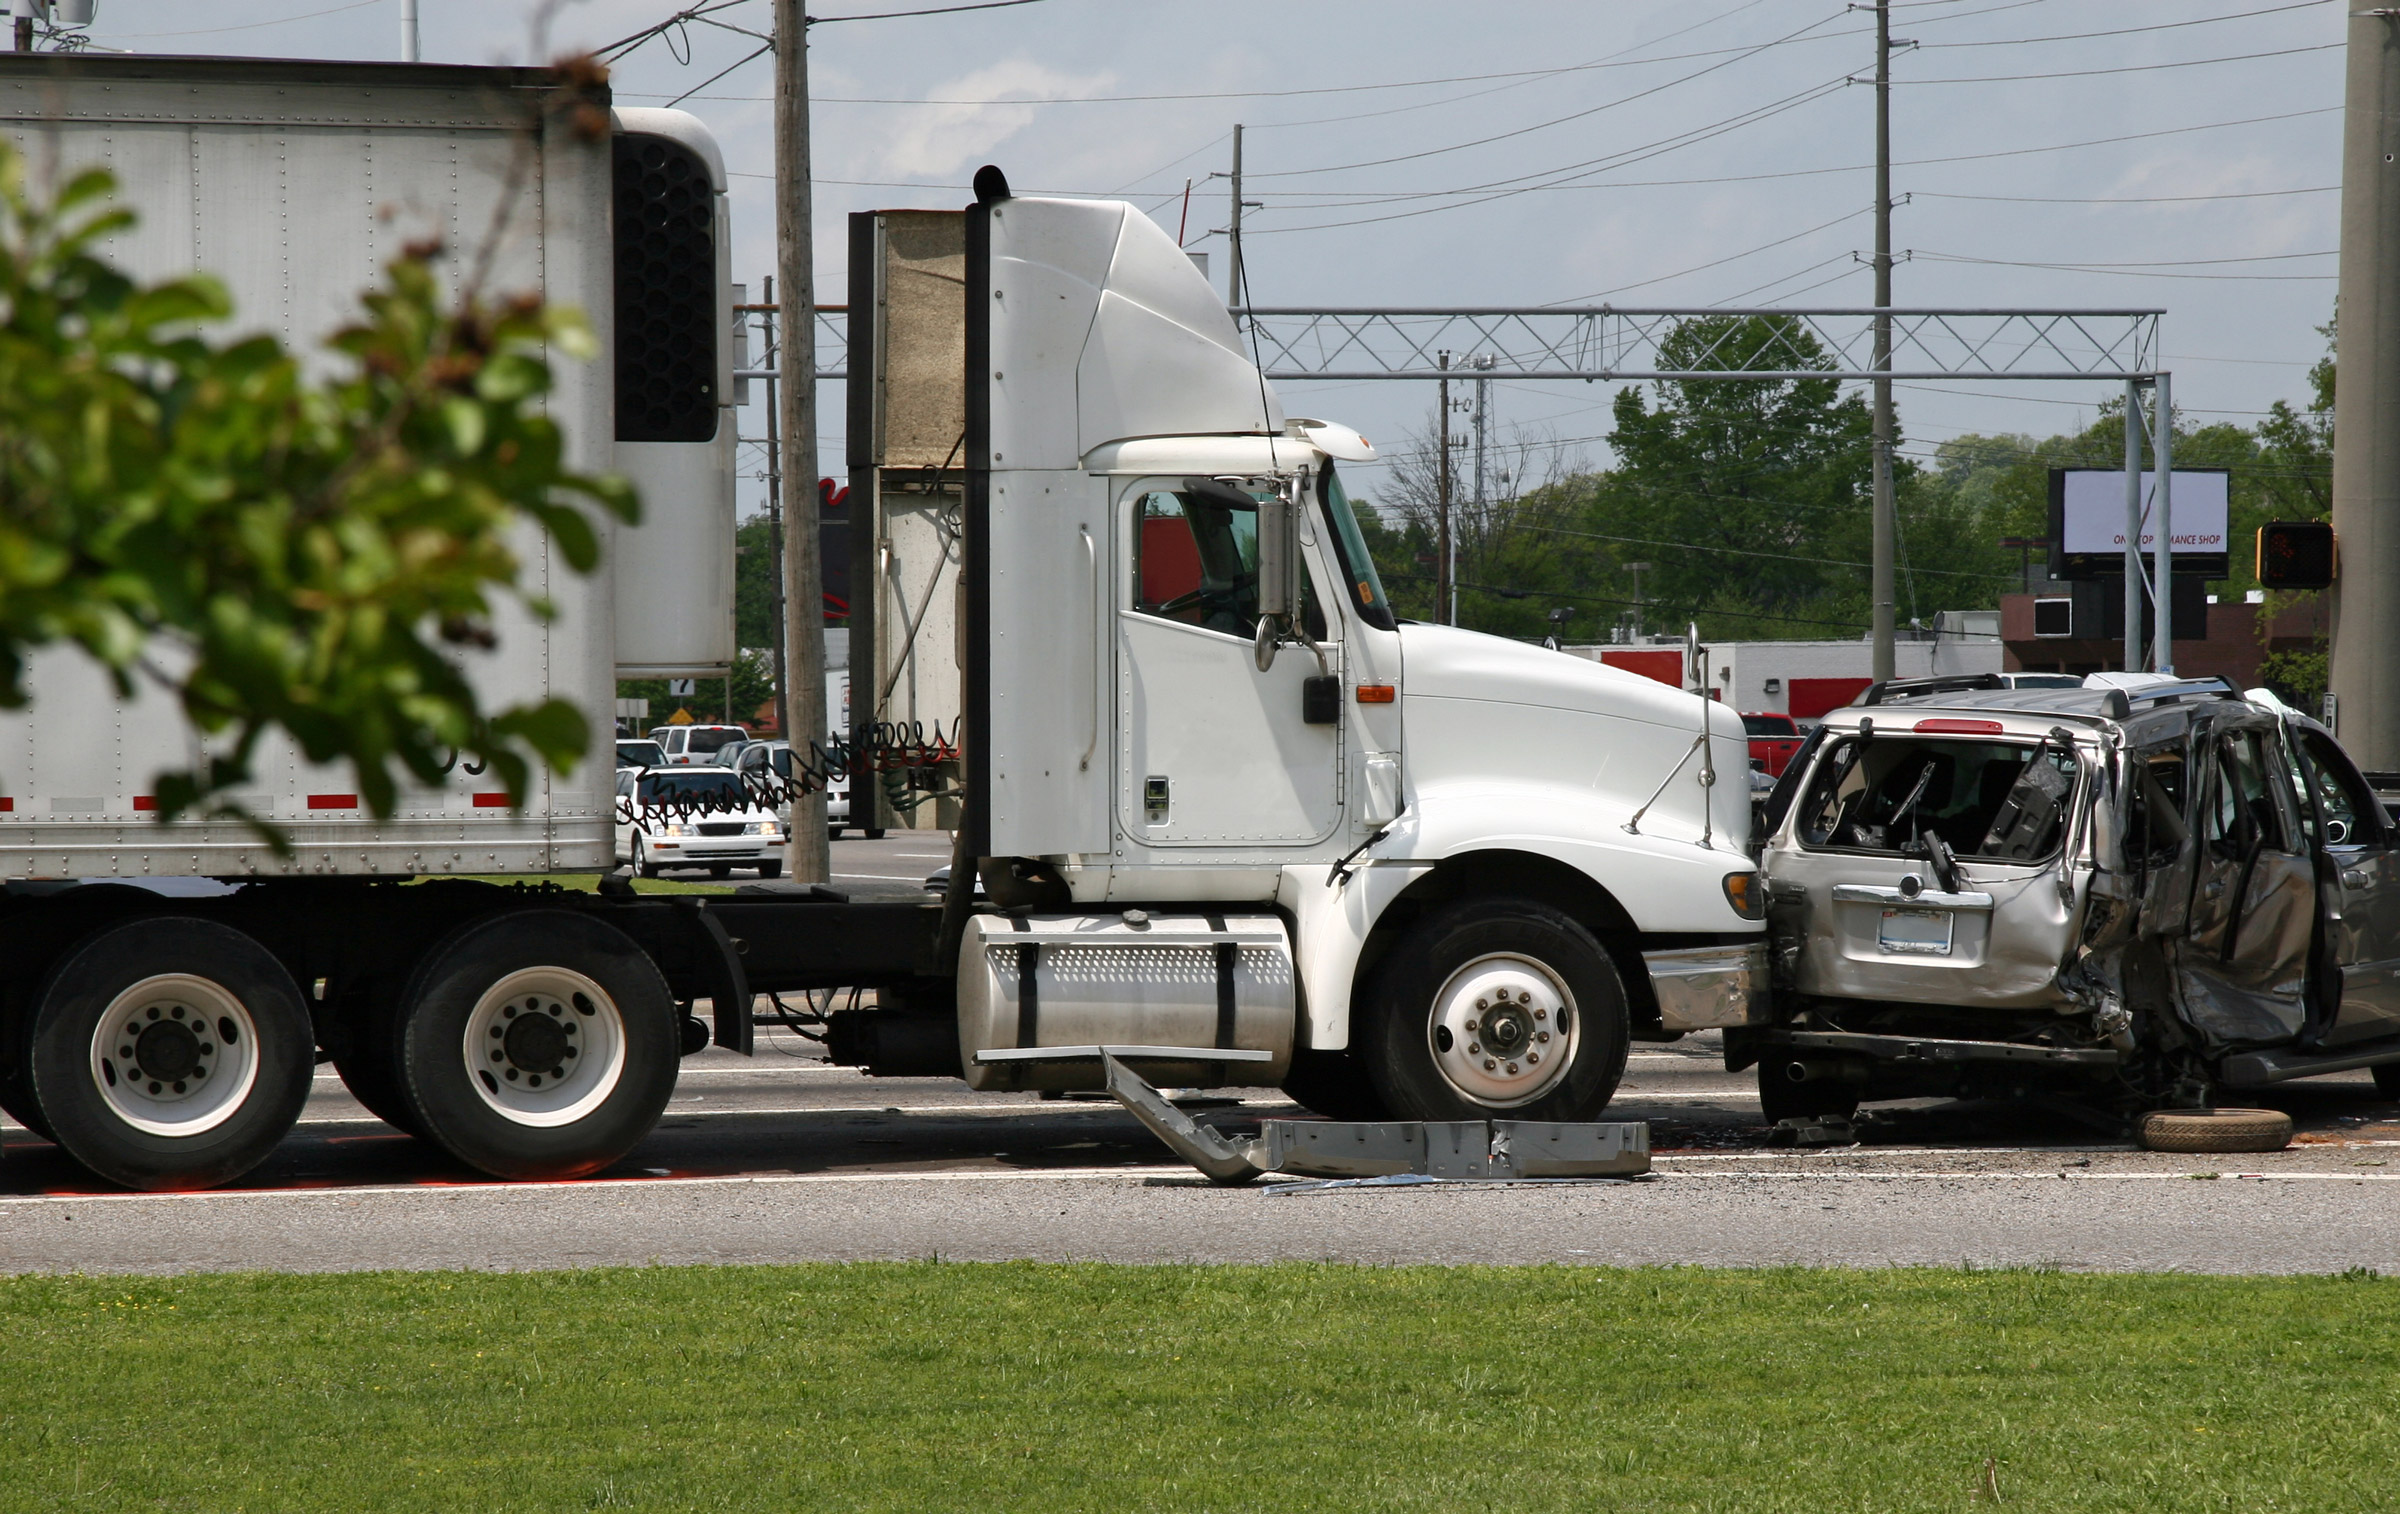 Semi-Truck-Rear-End-Crash-with-Van